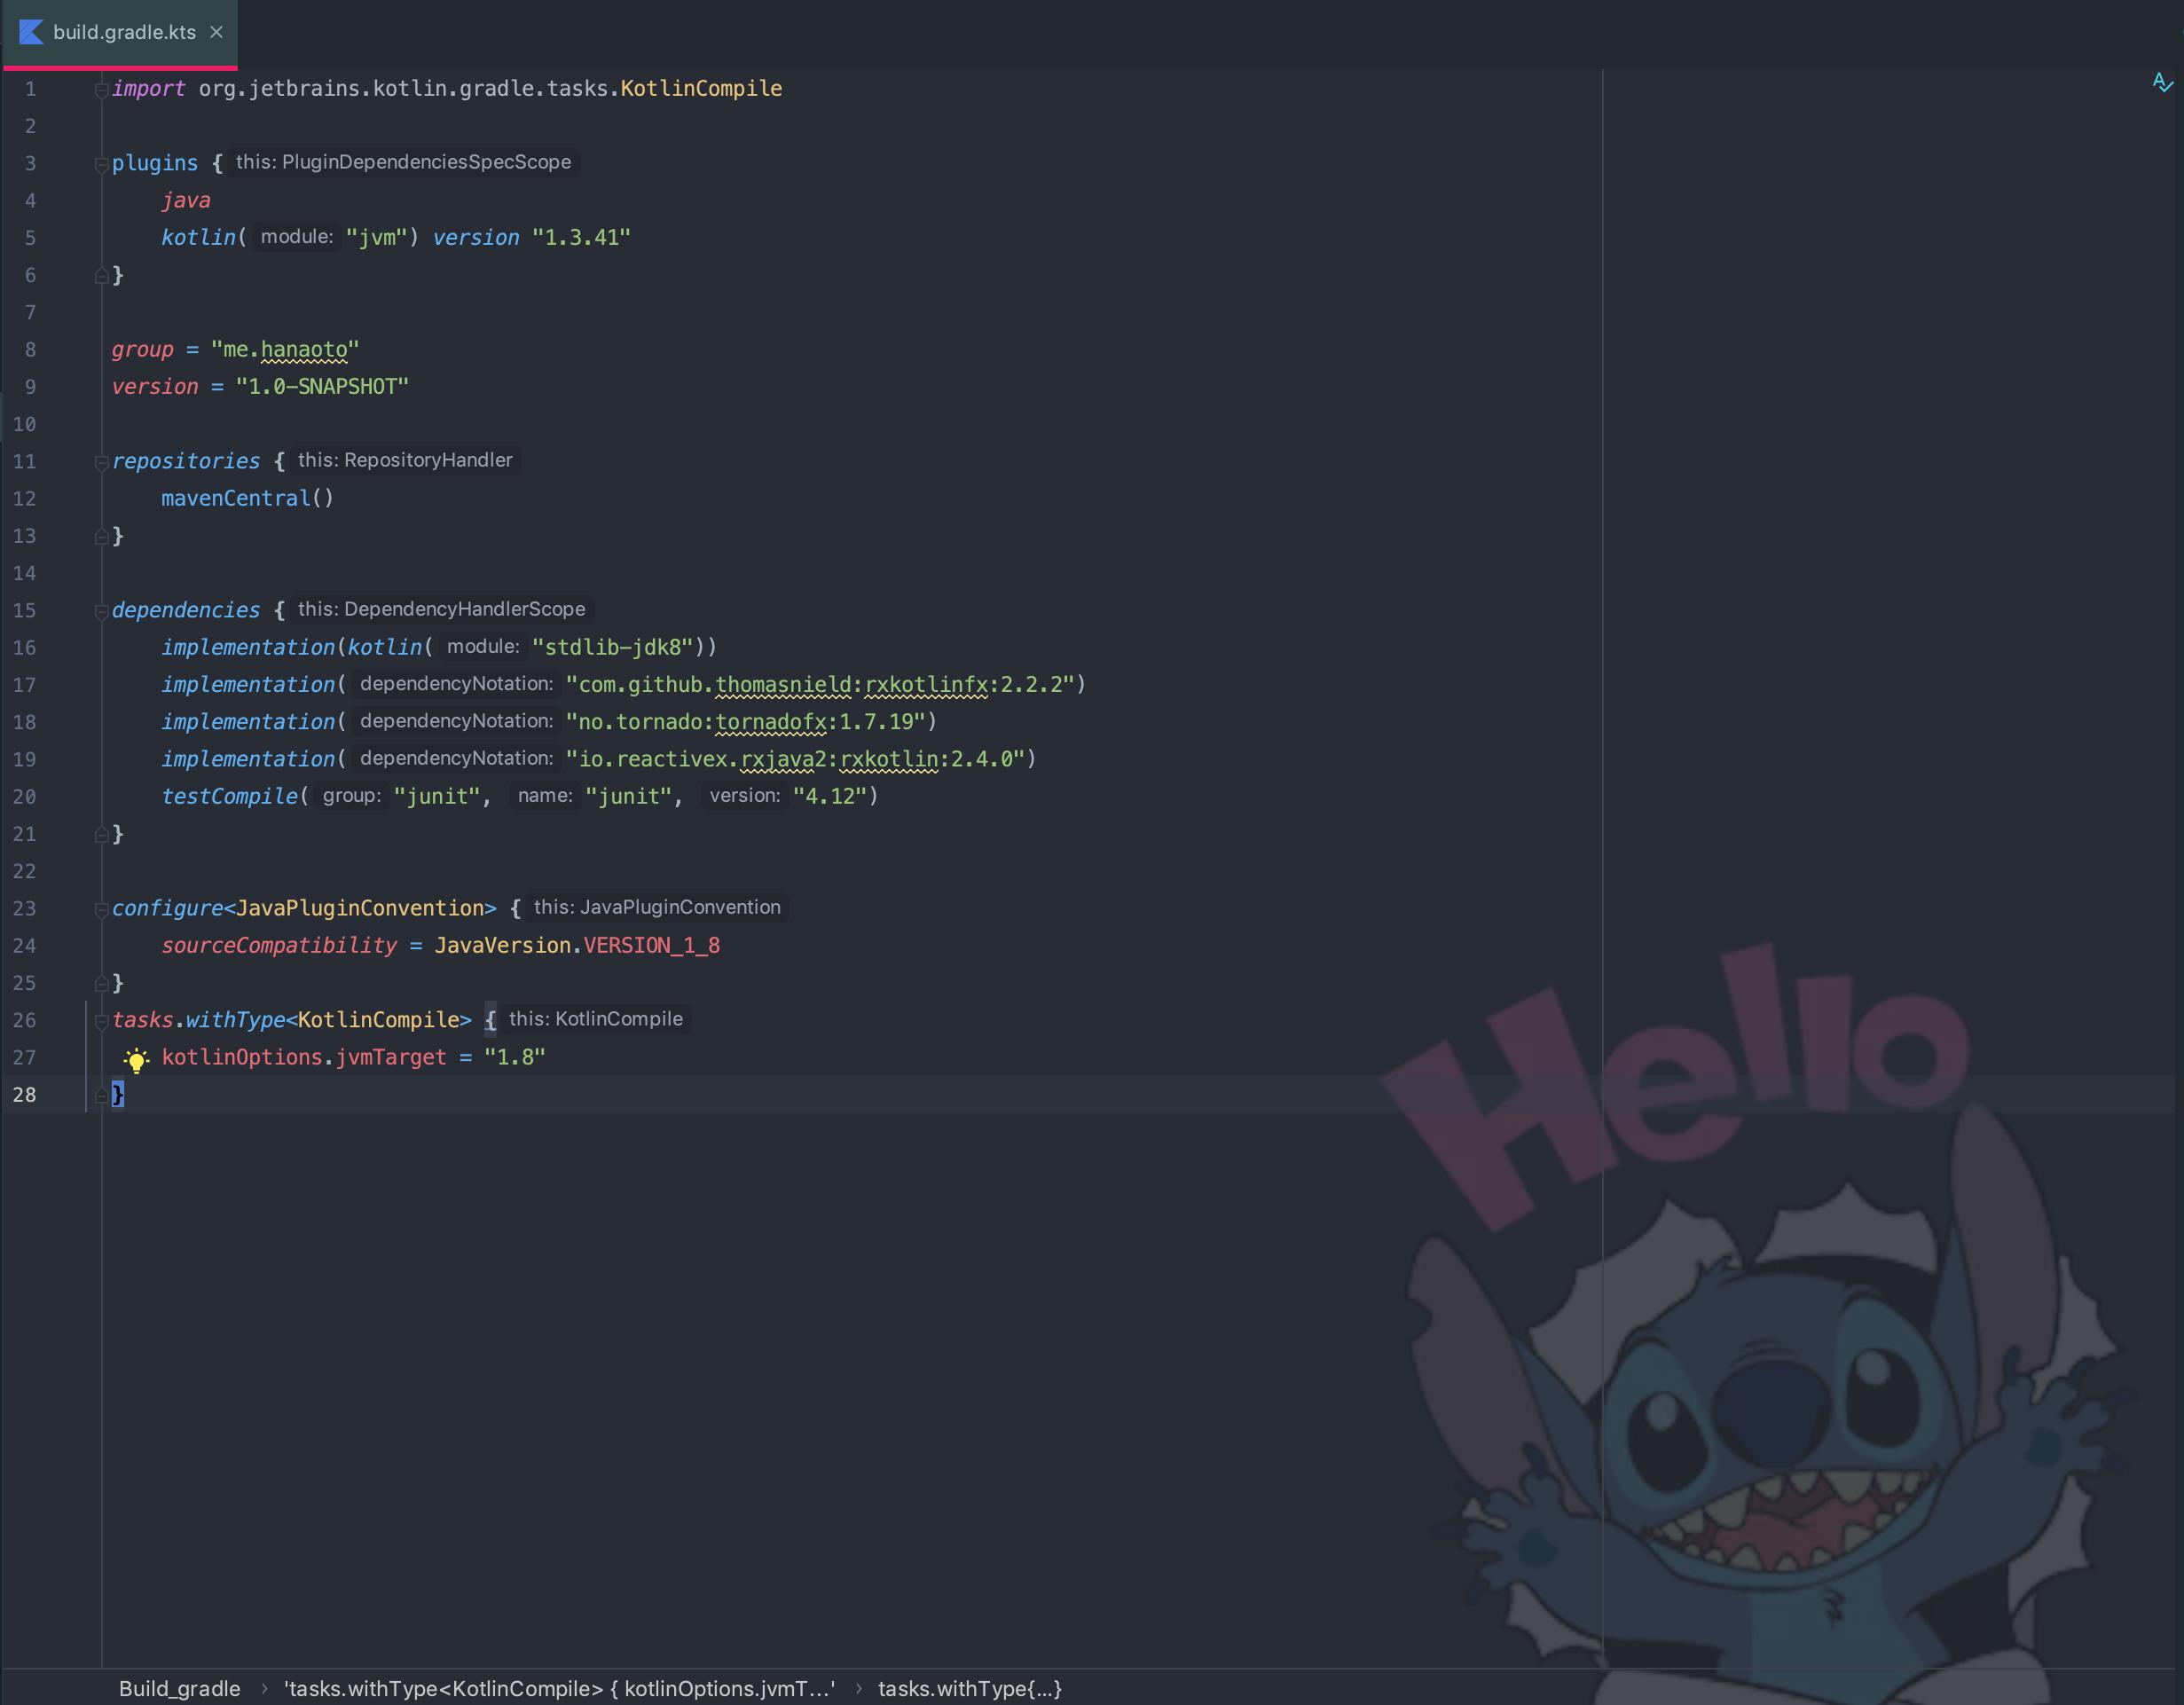 build.gradle.kts with some dependencies